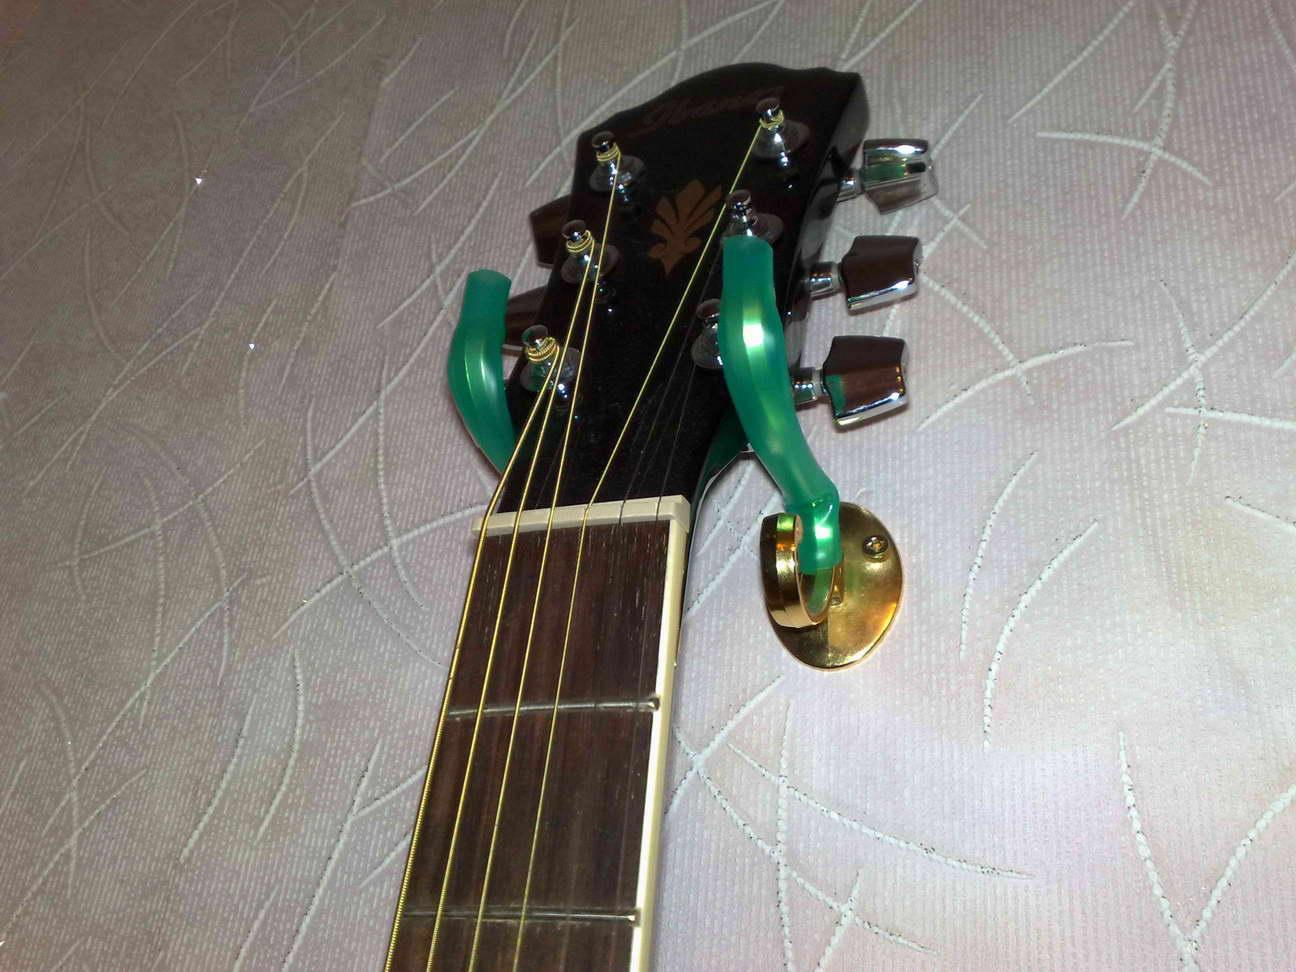 Кронштейн для гитары на стену